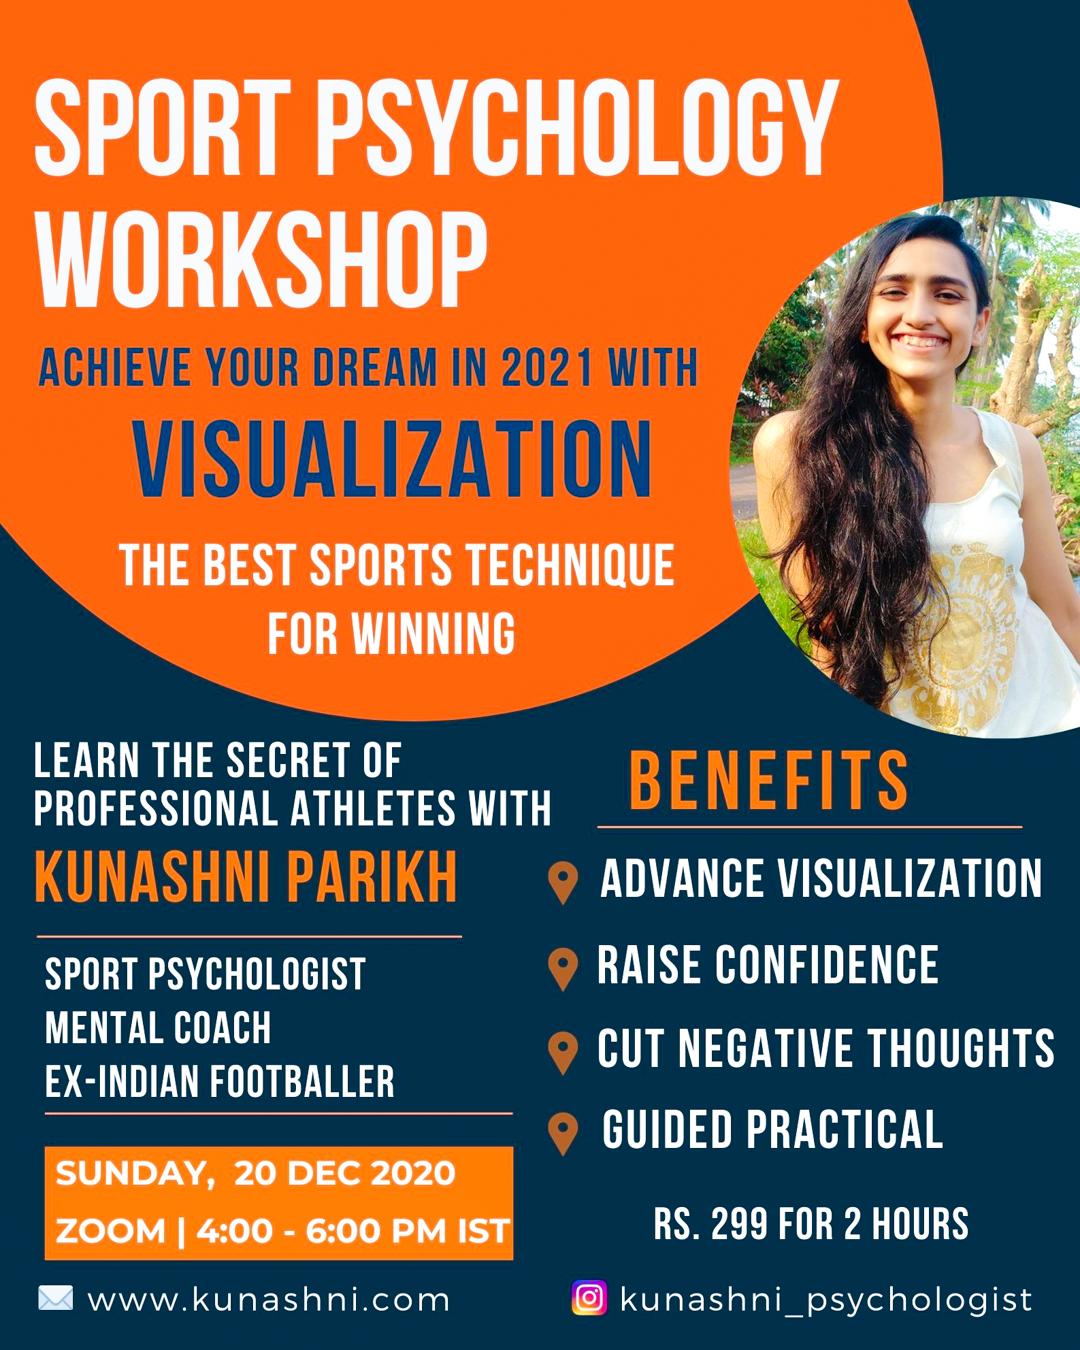 Sport Psychology Workshop - 2 - Visualization Training with Mental Coach Kunashni Parikh